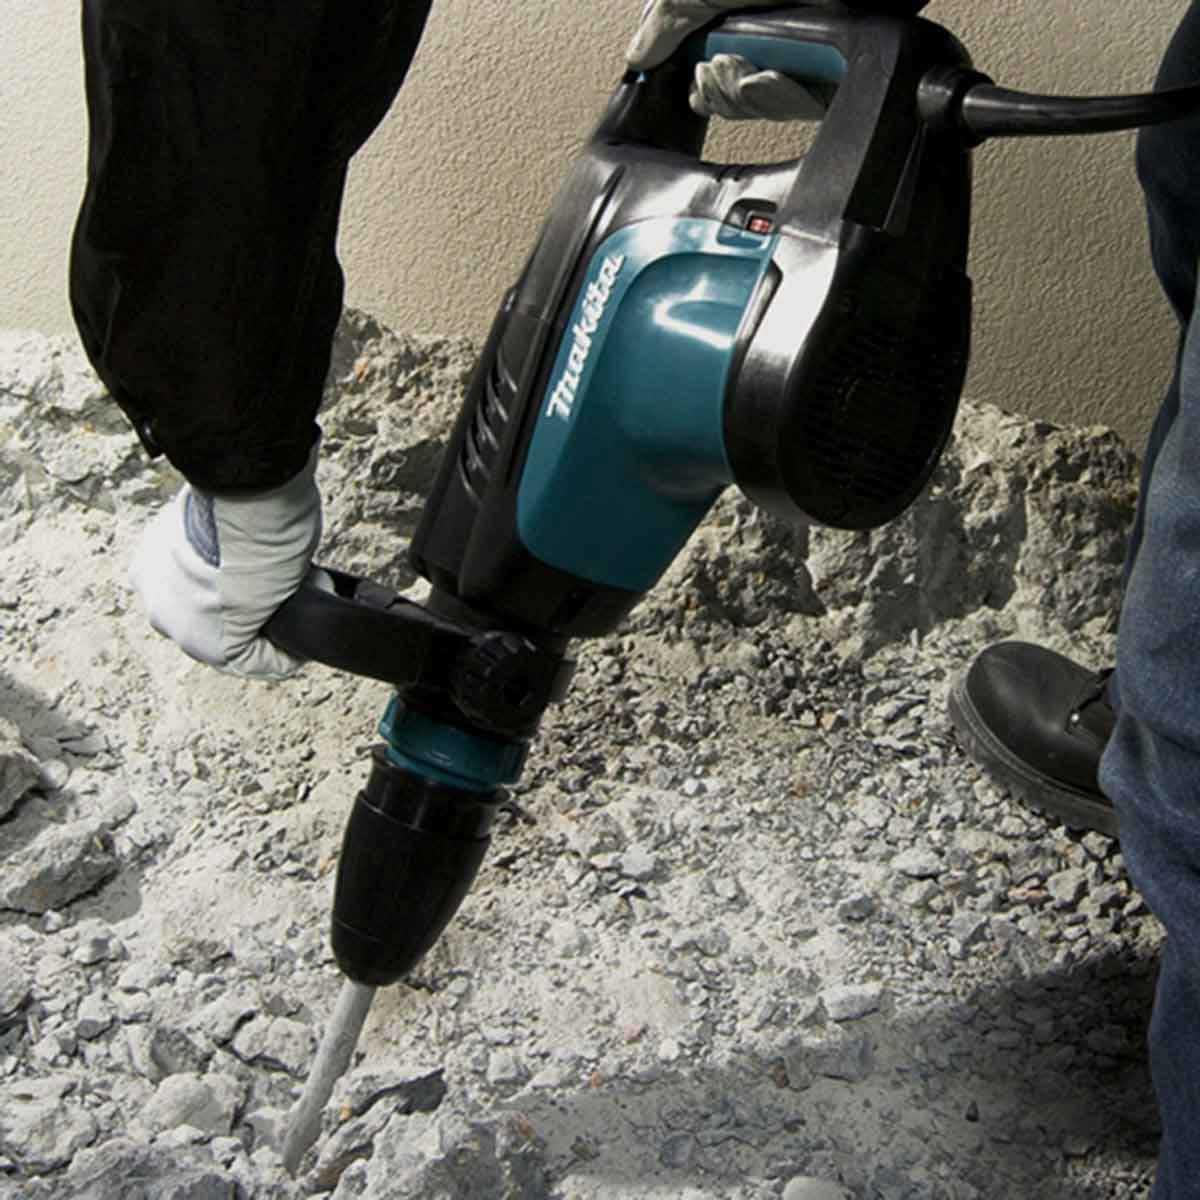 HM1203C Makita Demo Hammer floor